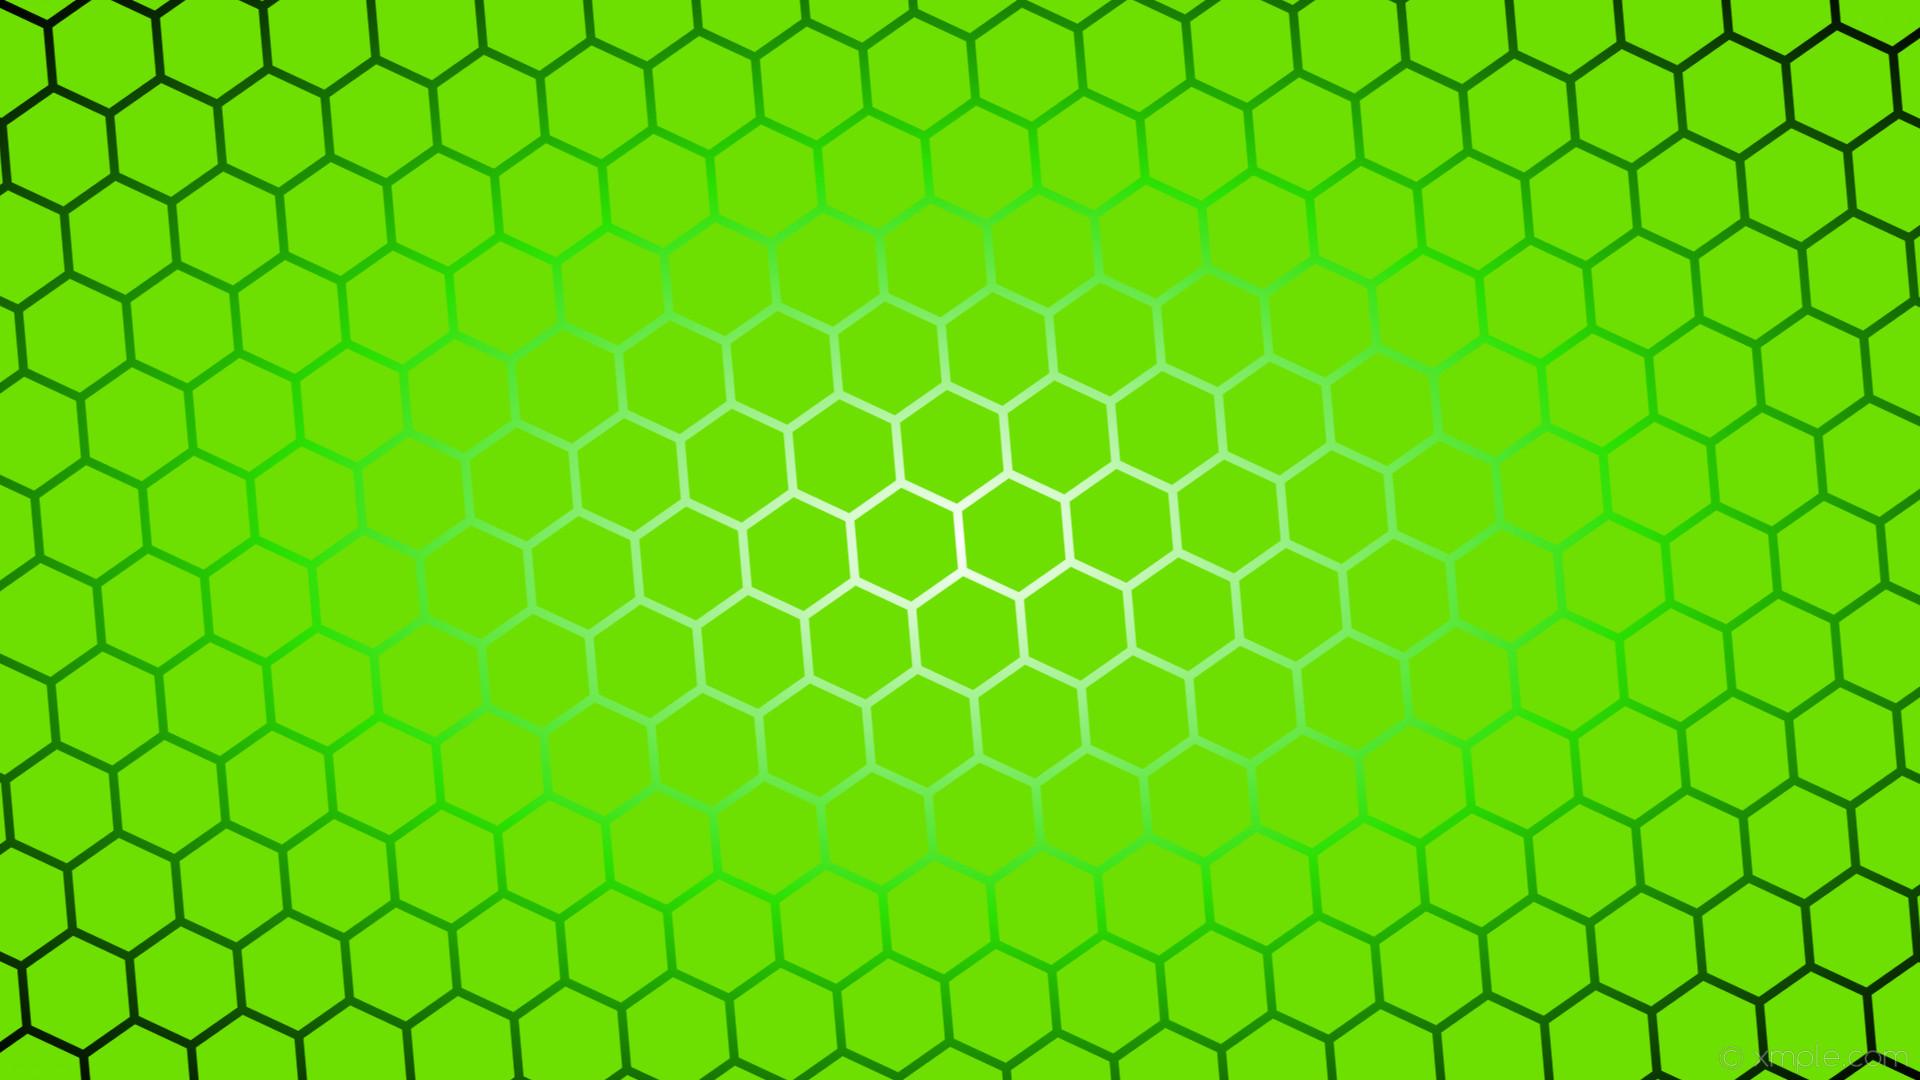 wallpaper lime green black white gradient glow hexagon #6ee001 #ffffff  #2be001 diagonal 5